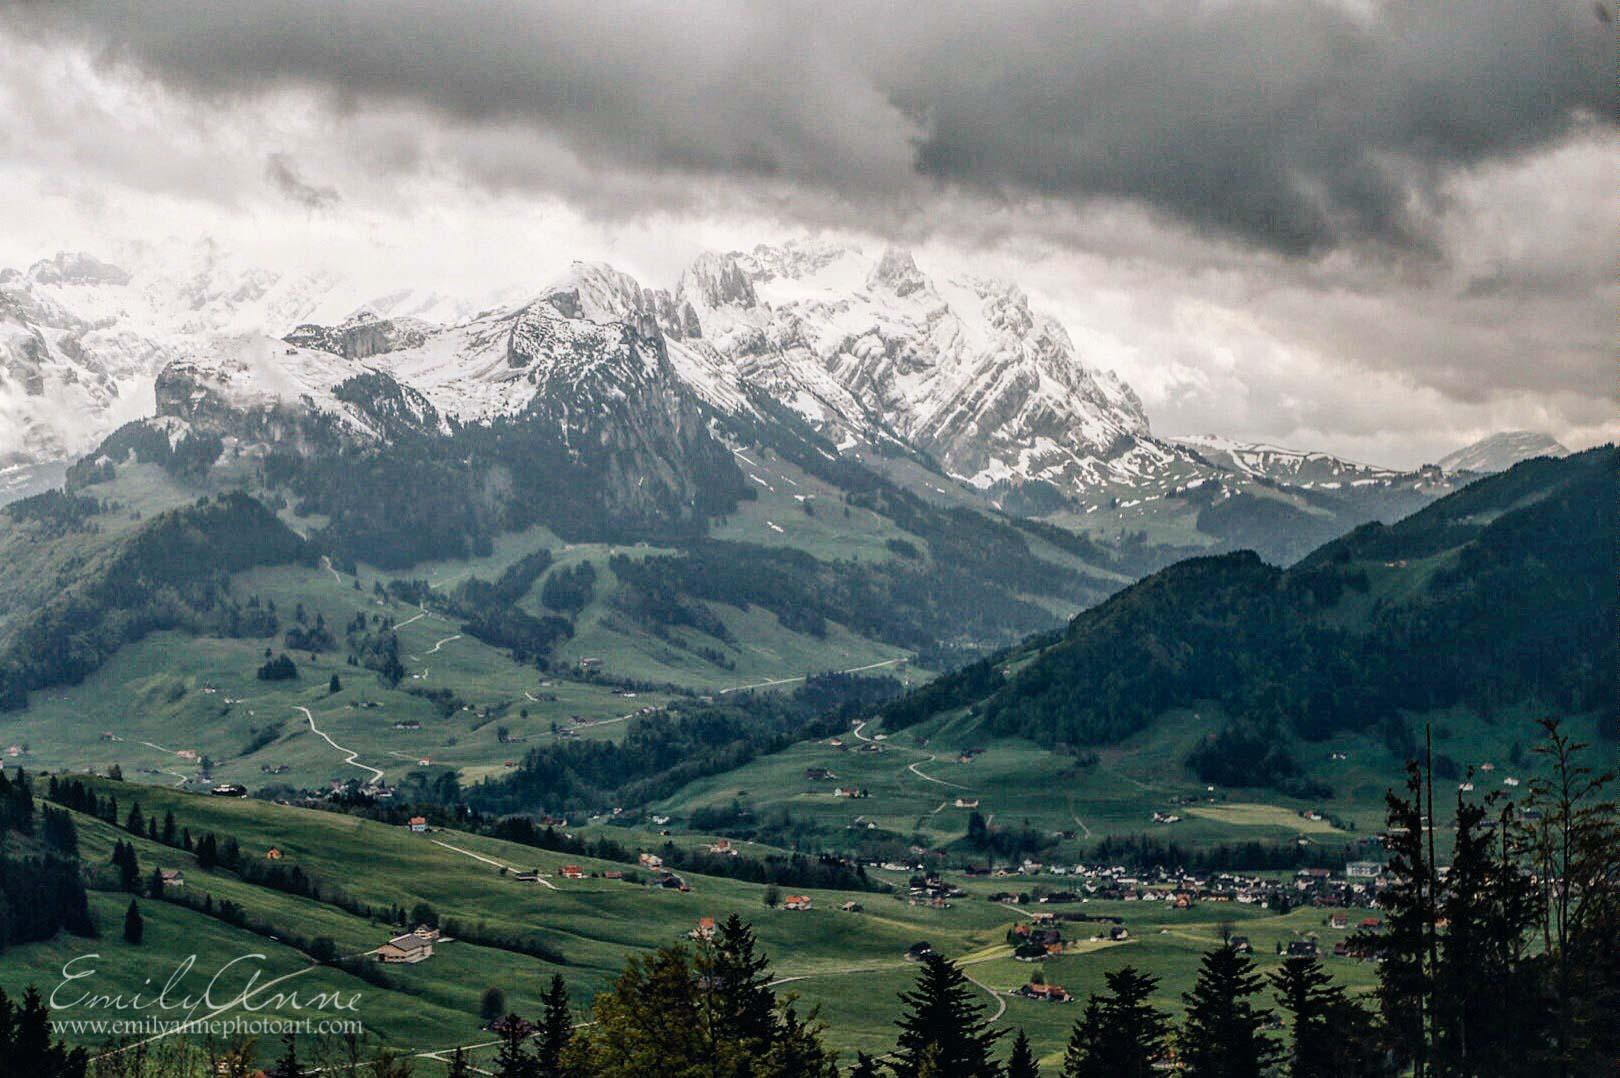 best photos of the swiss alps, shot in appenzell switzerland